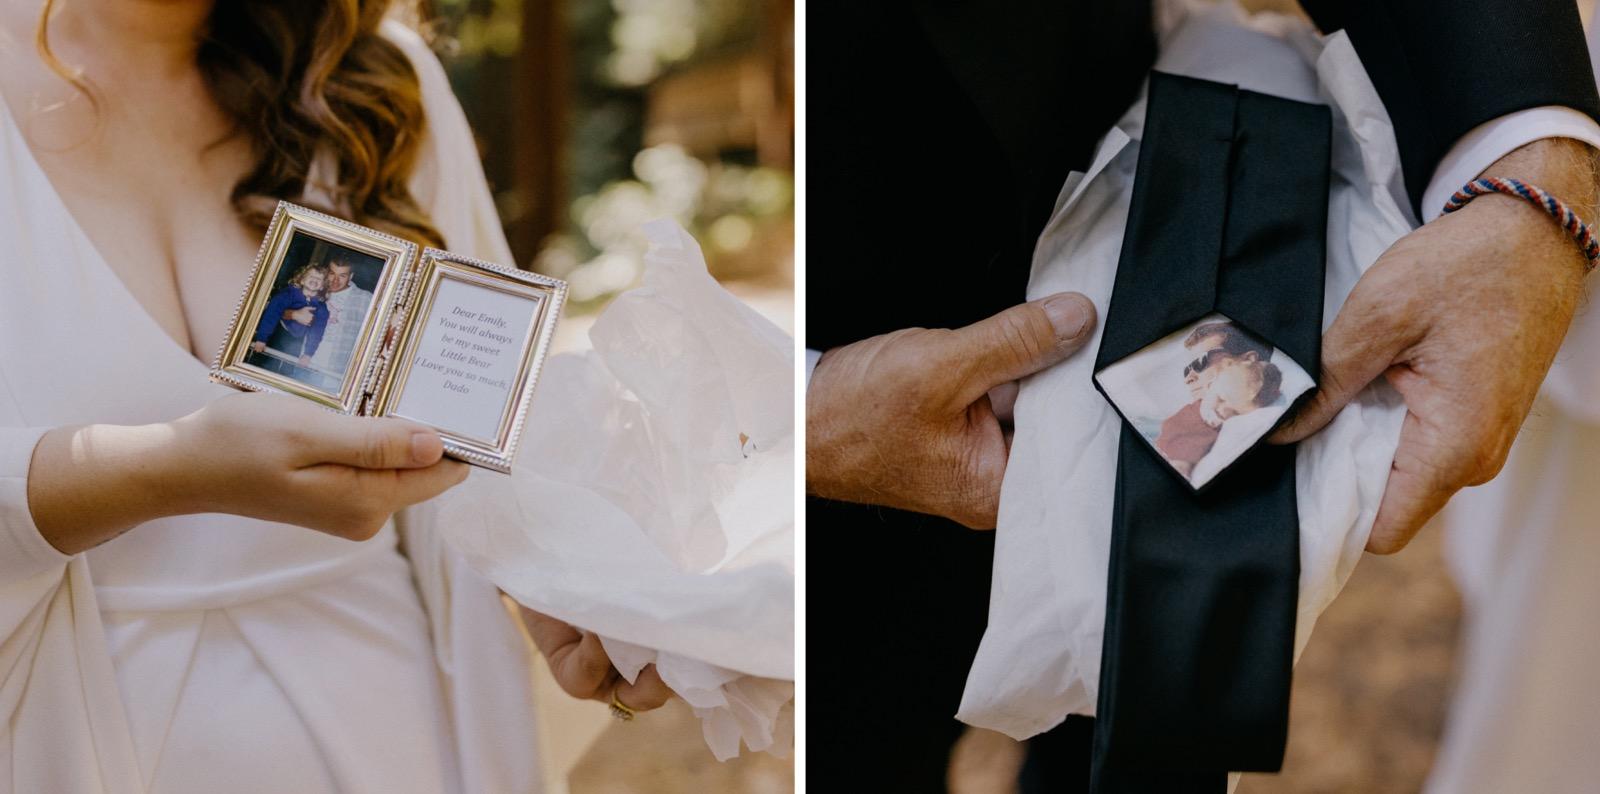 023_Emily & Jeff Wedding 0179_Emily & Jeff Wedding 0178_moments_bride_first-look_father_wedding